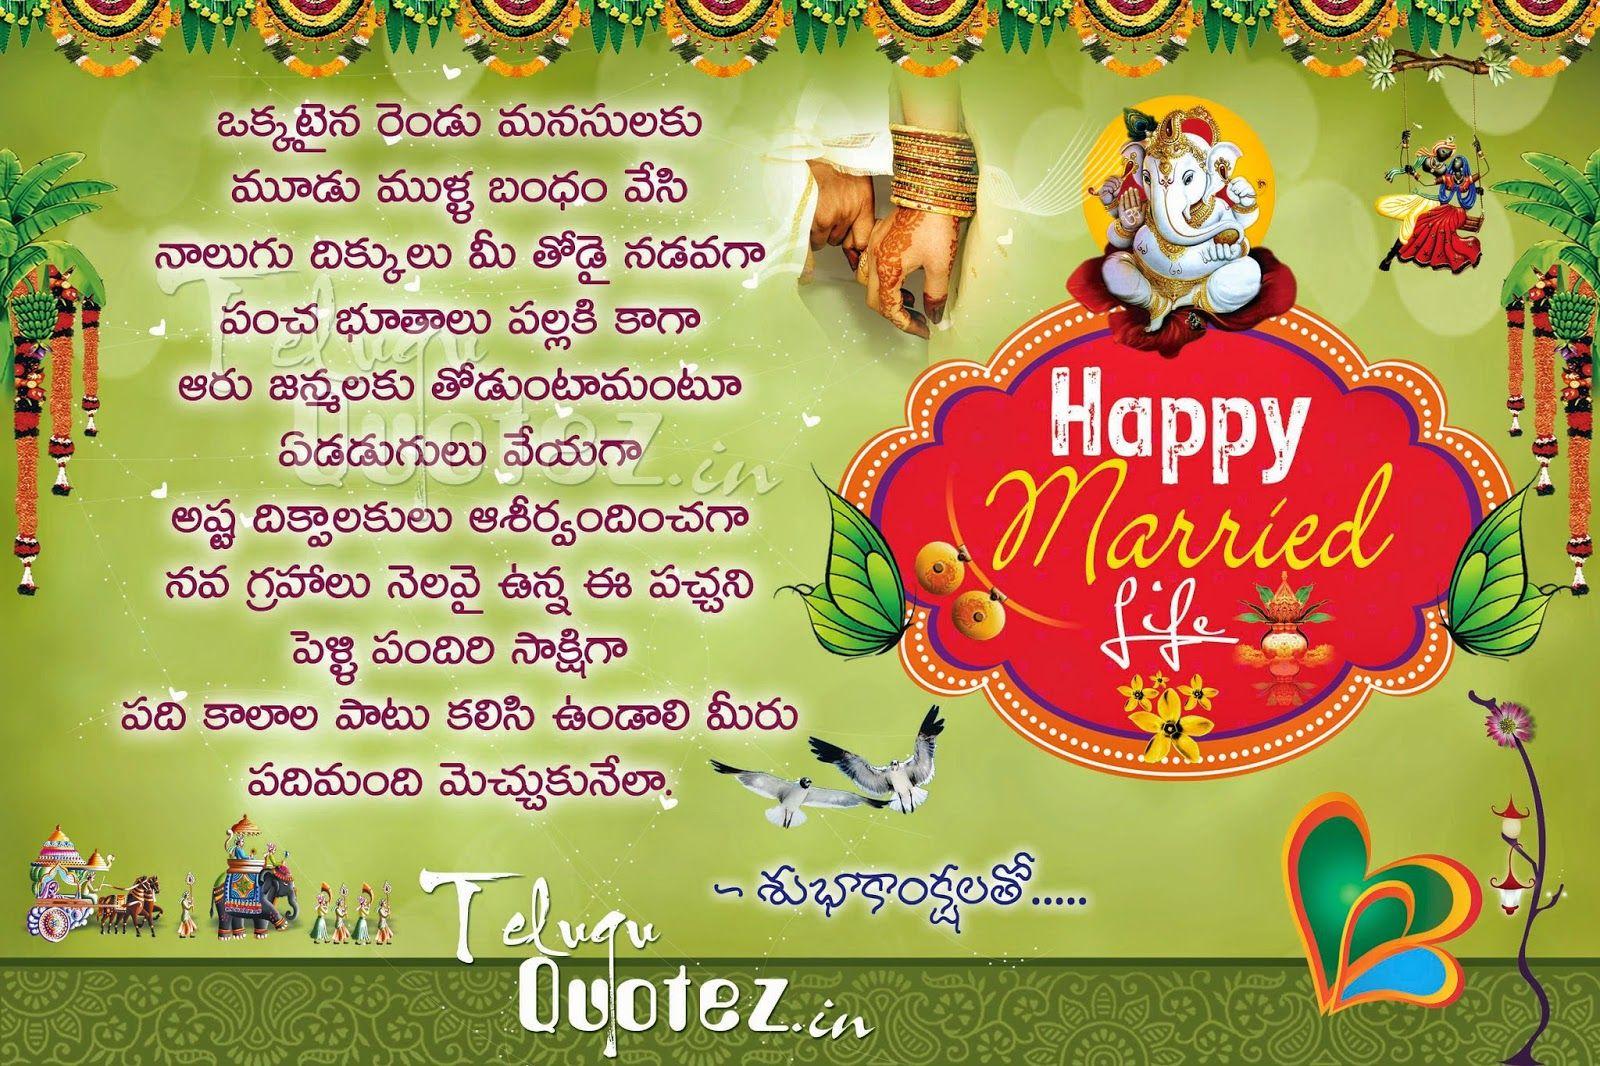 indian Wedding telugu wishes for couples Wedding day